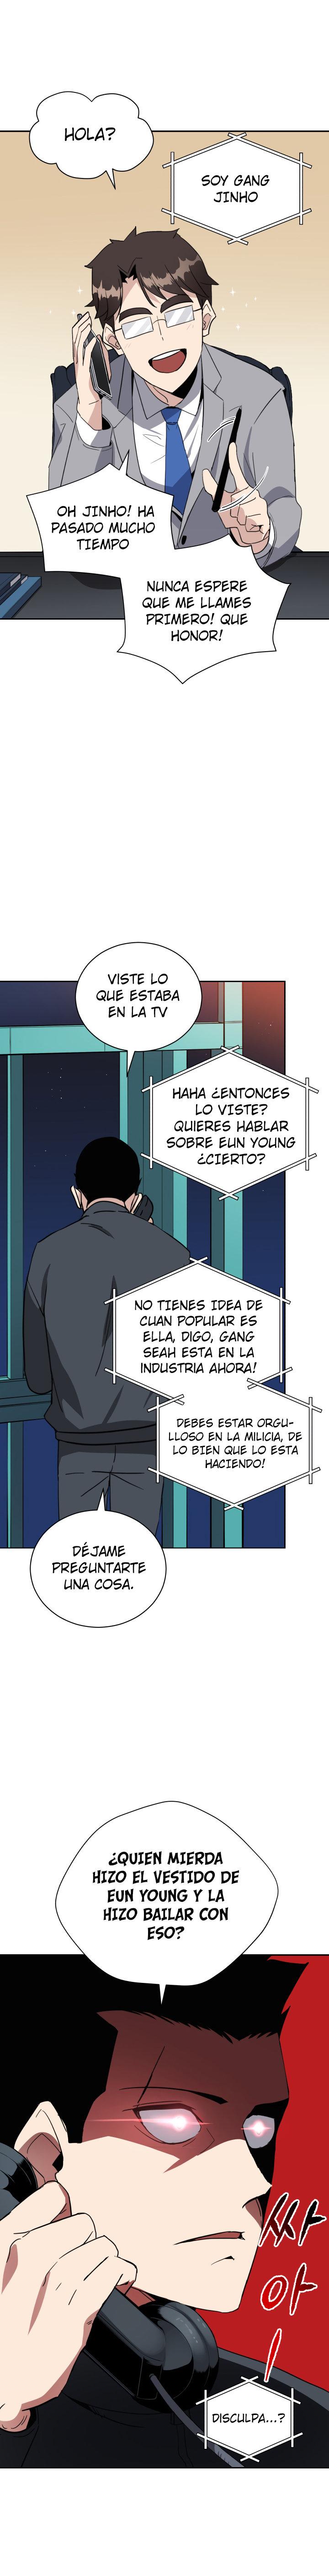 https://nine.mangadogs.com/es_manga/pic8/53/35509/940792/8a165b628ff99e559127aa8359a86573.jpg Page 17